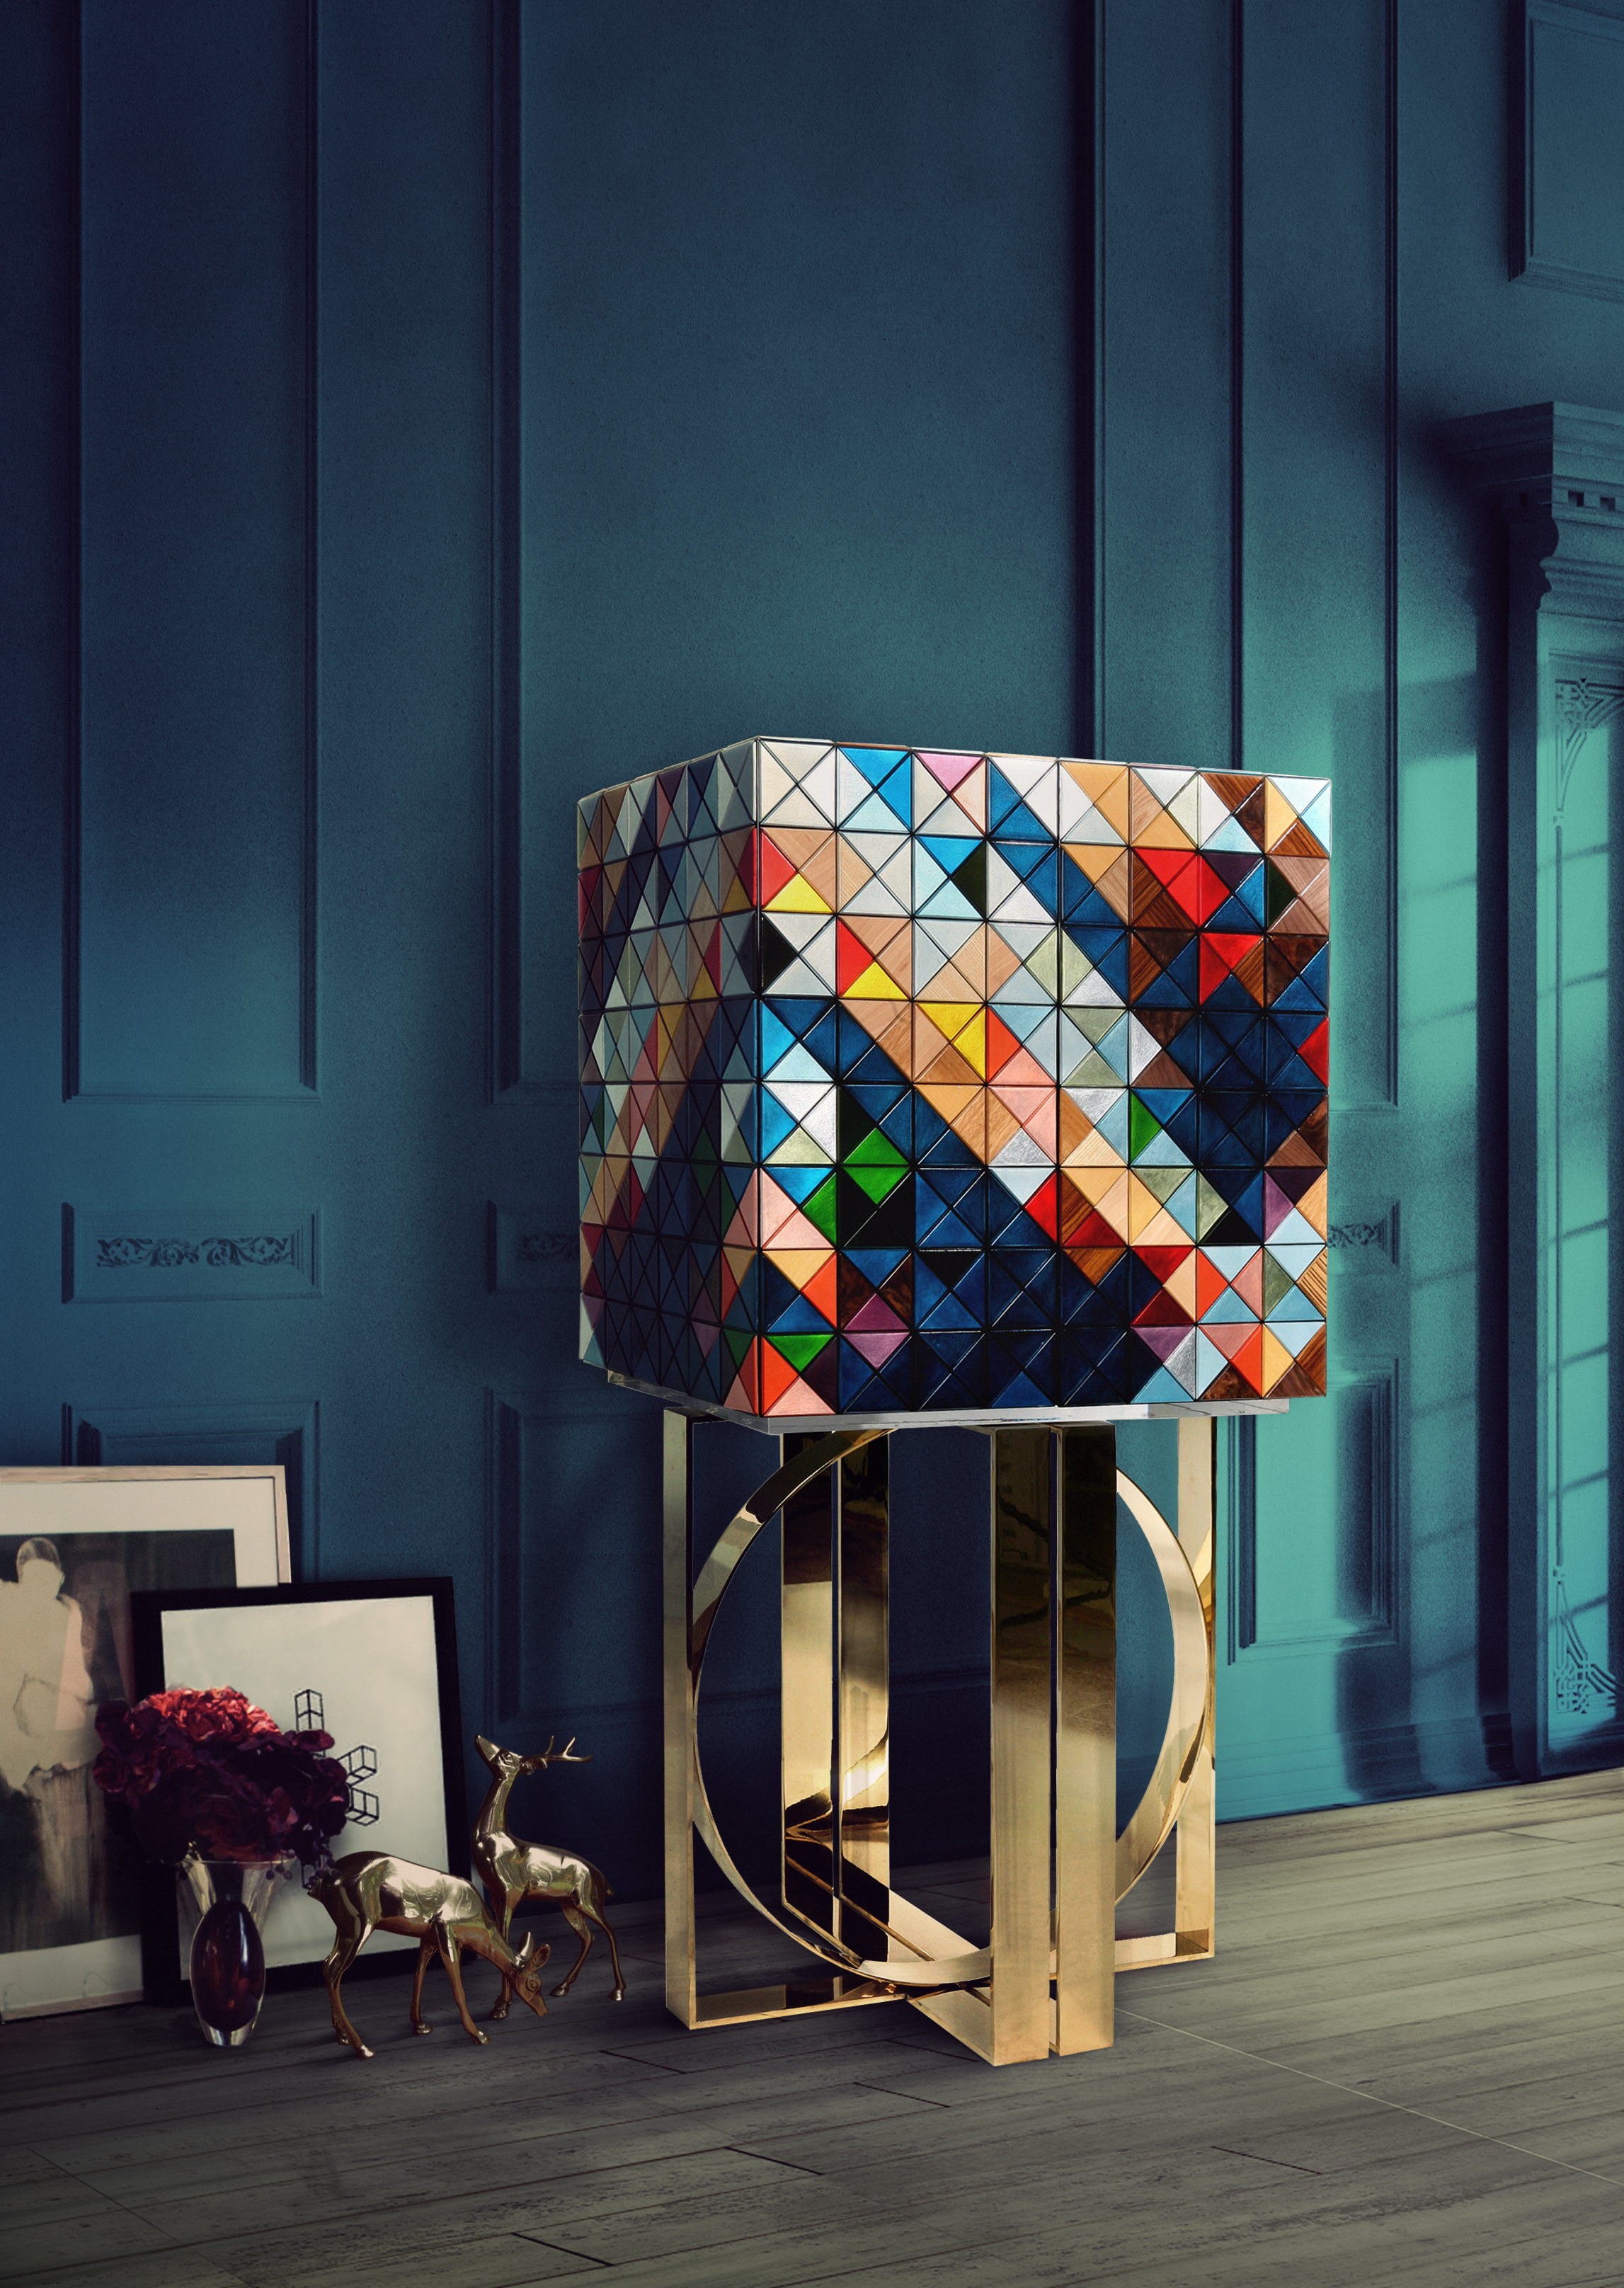 boca do lobo Iconic Creations by Boca do Lobo: The Unparalleled Pixel Pixel by Boca do Lobo A Symbol Of Change